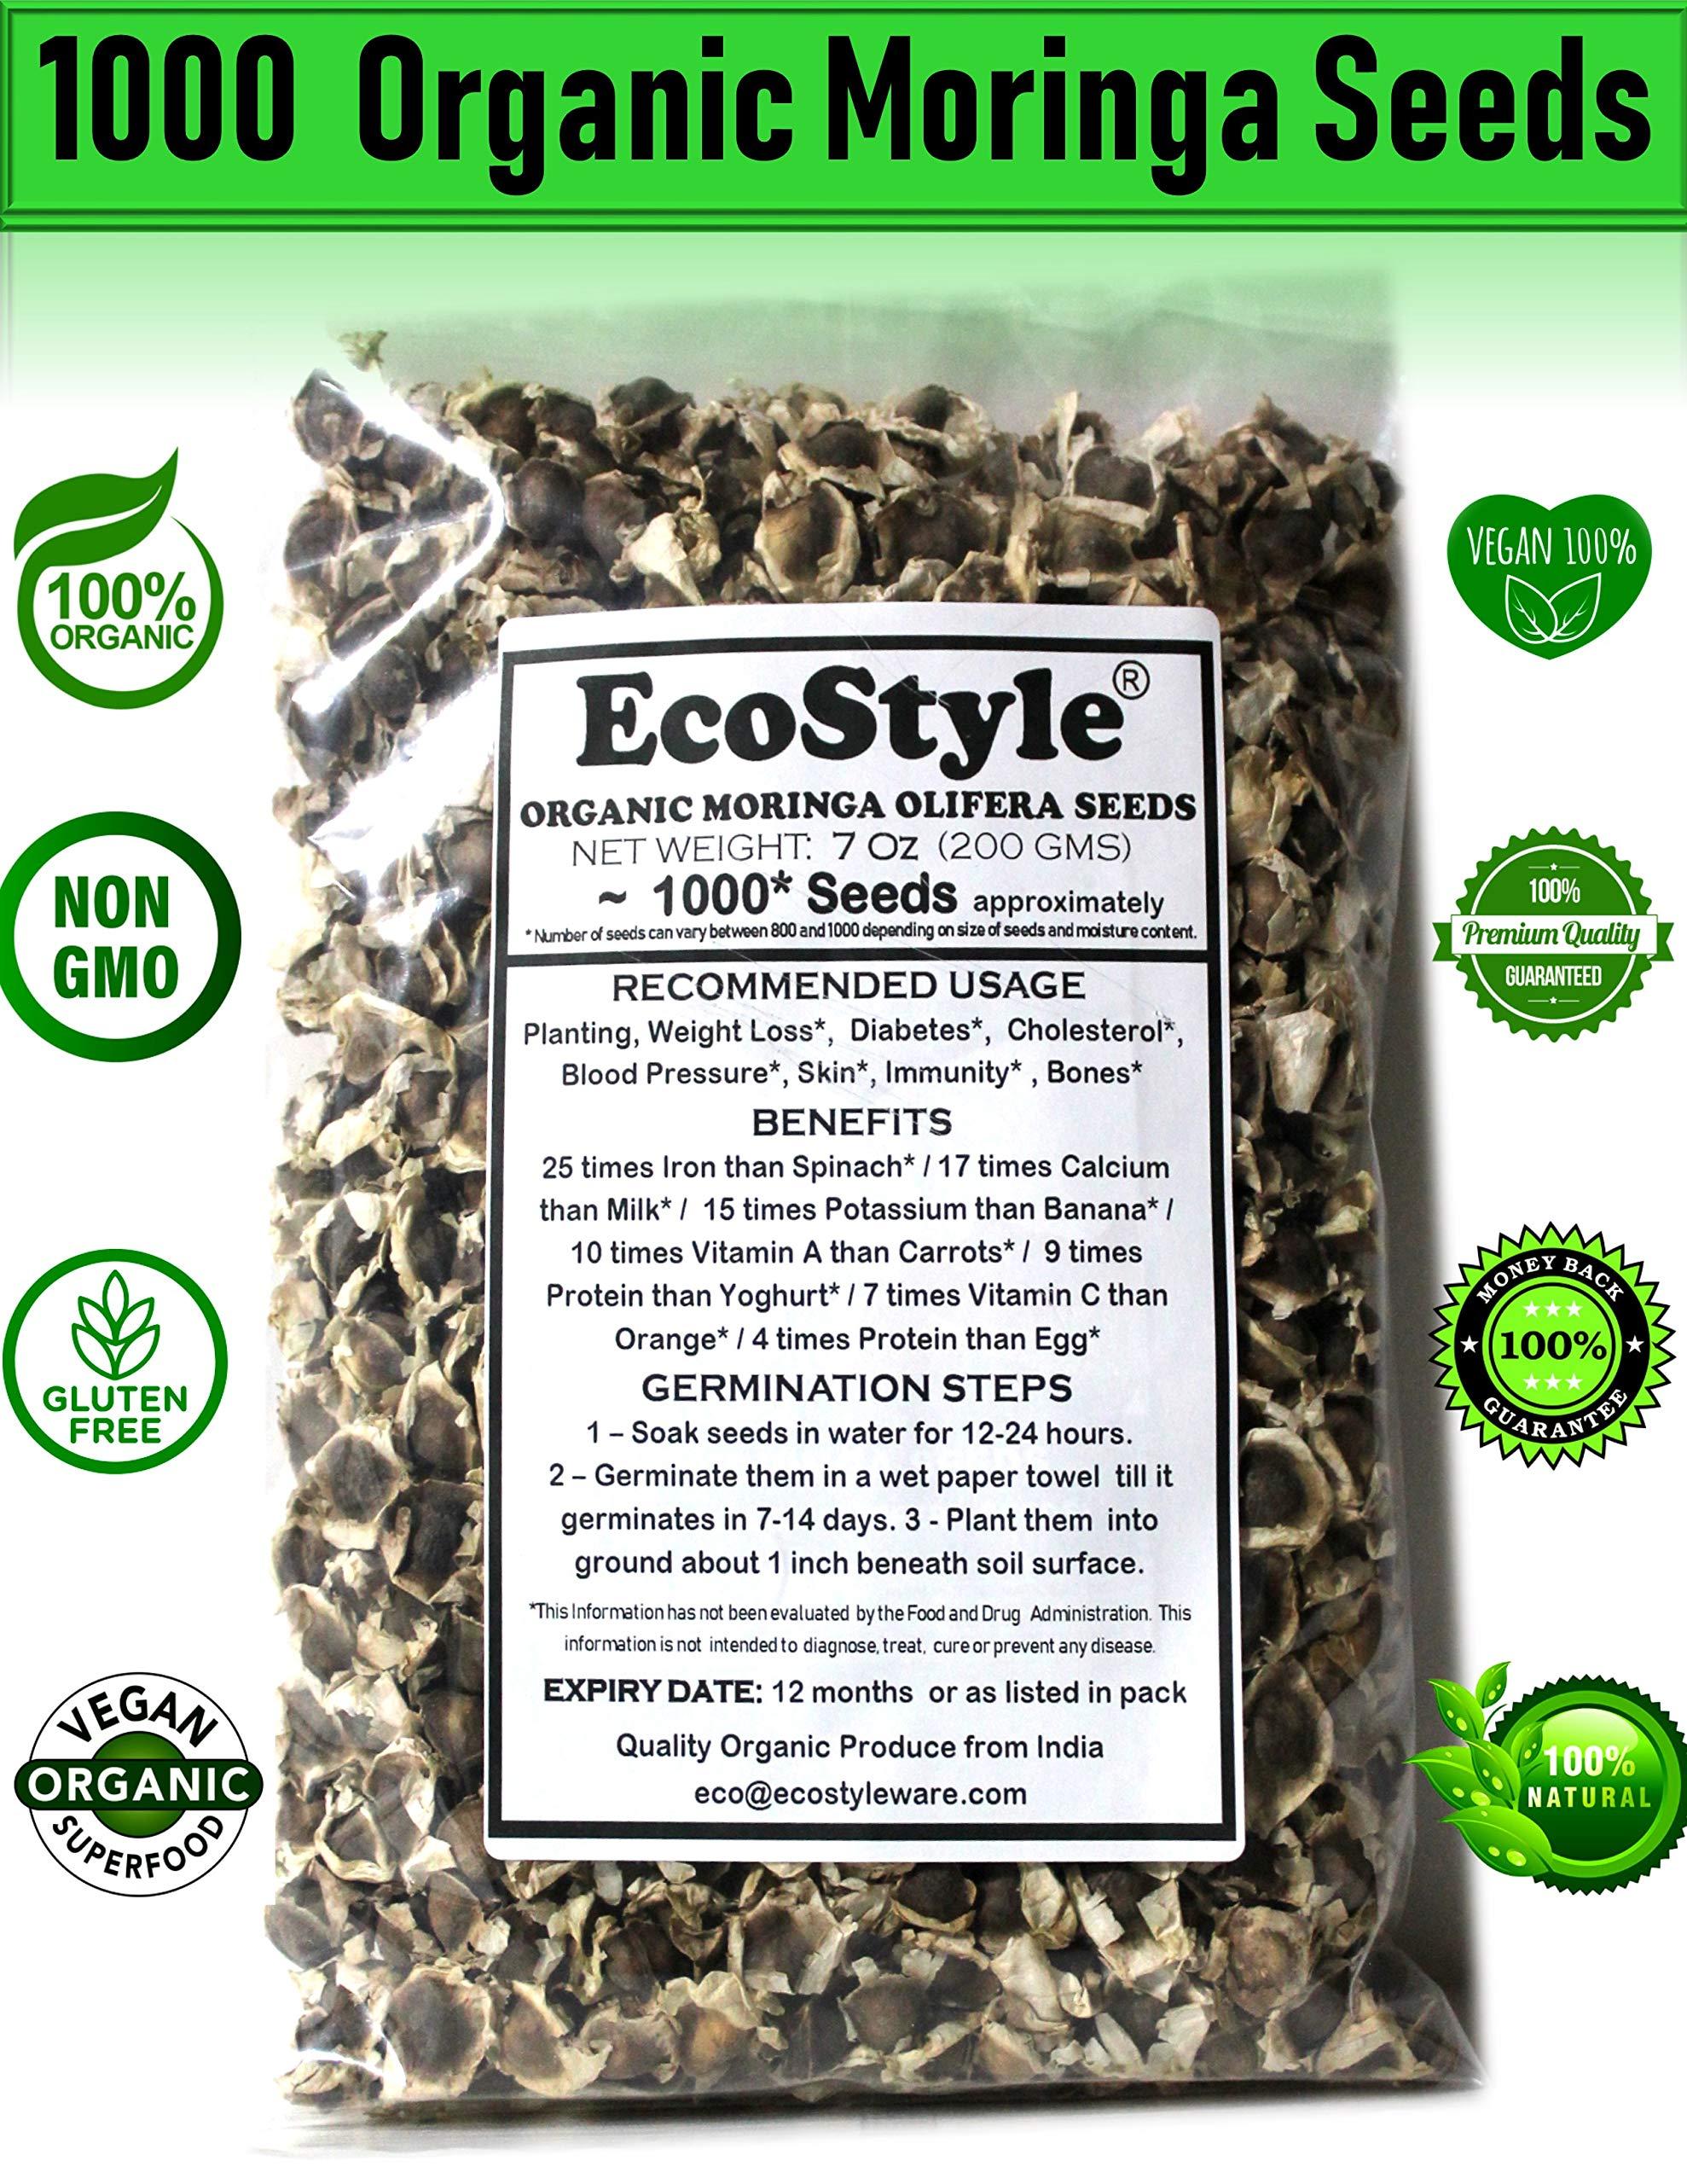 Ecostyle | Organic Moringa Seeds | 1000 Seeds Approx.| Premium Quality | PKM1 Variety | 200 GMS | Edible | Planting | Moringa Oleifera| Malunggay | Semillas De Moringa | Drumstick Tree | Non-GMO !